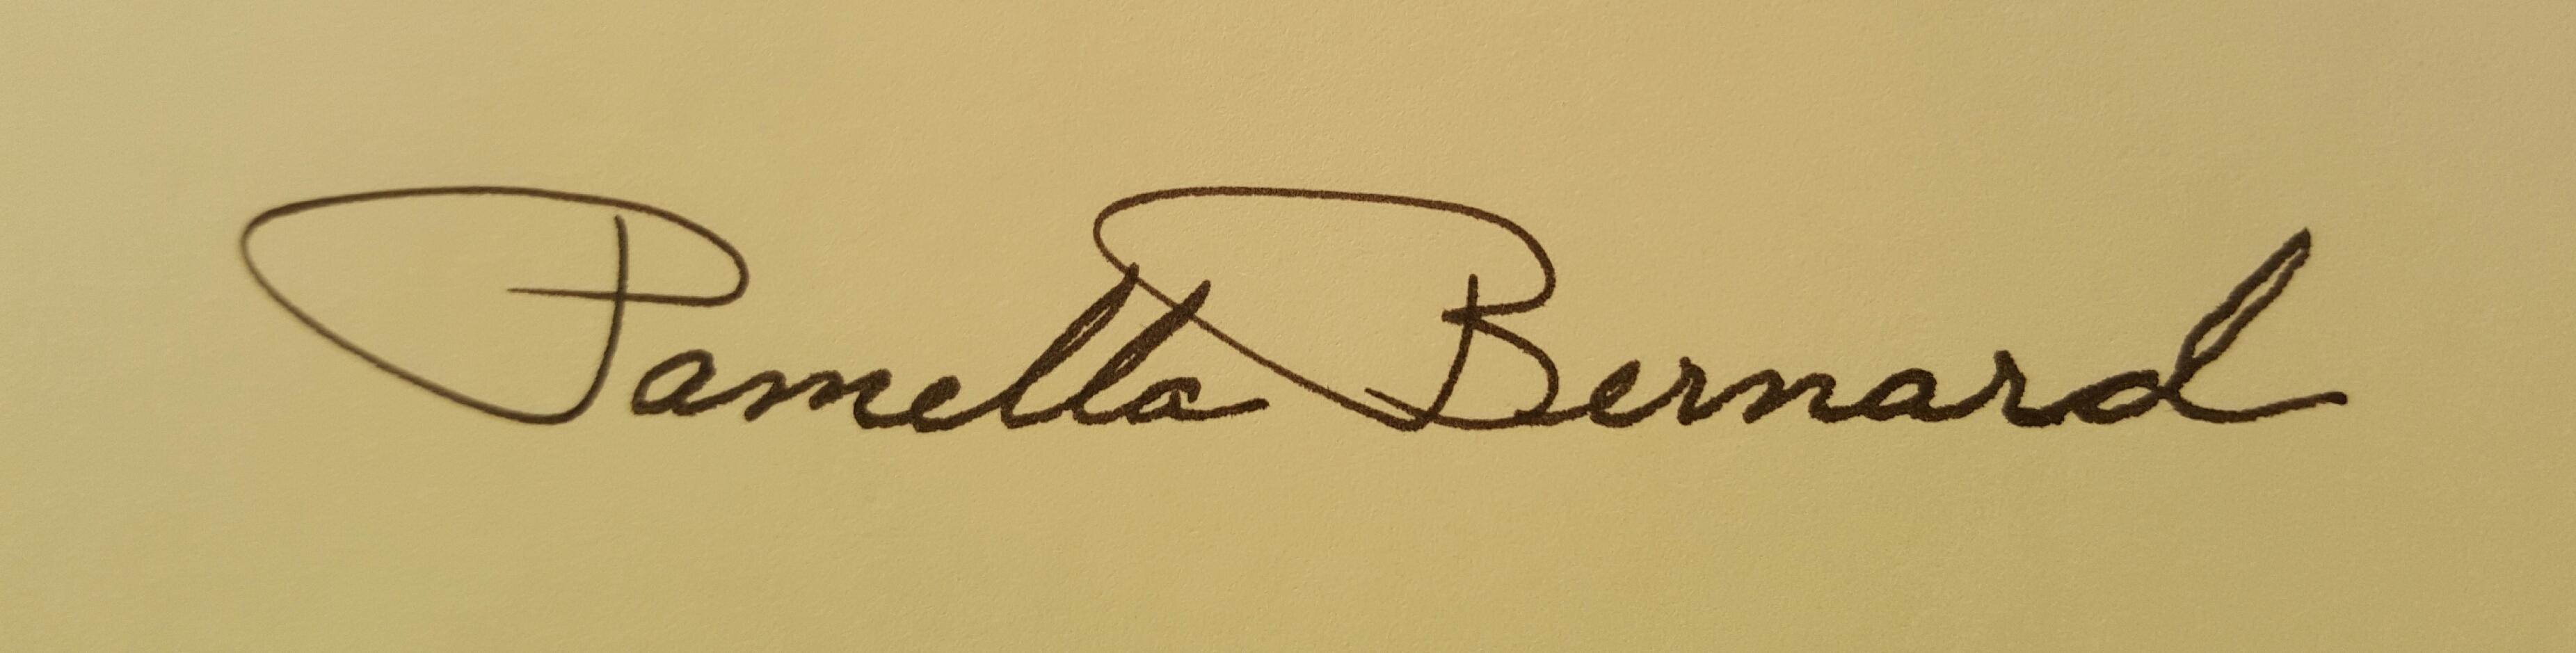 Pamella Bernard's Signature